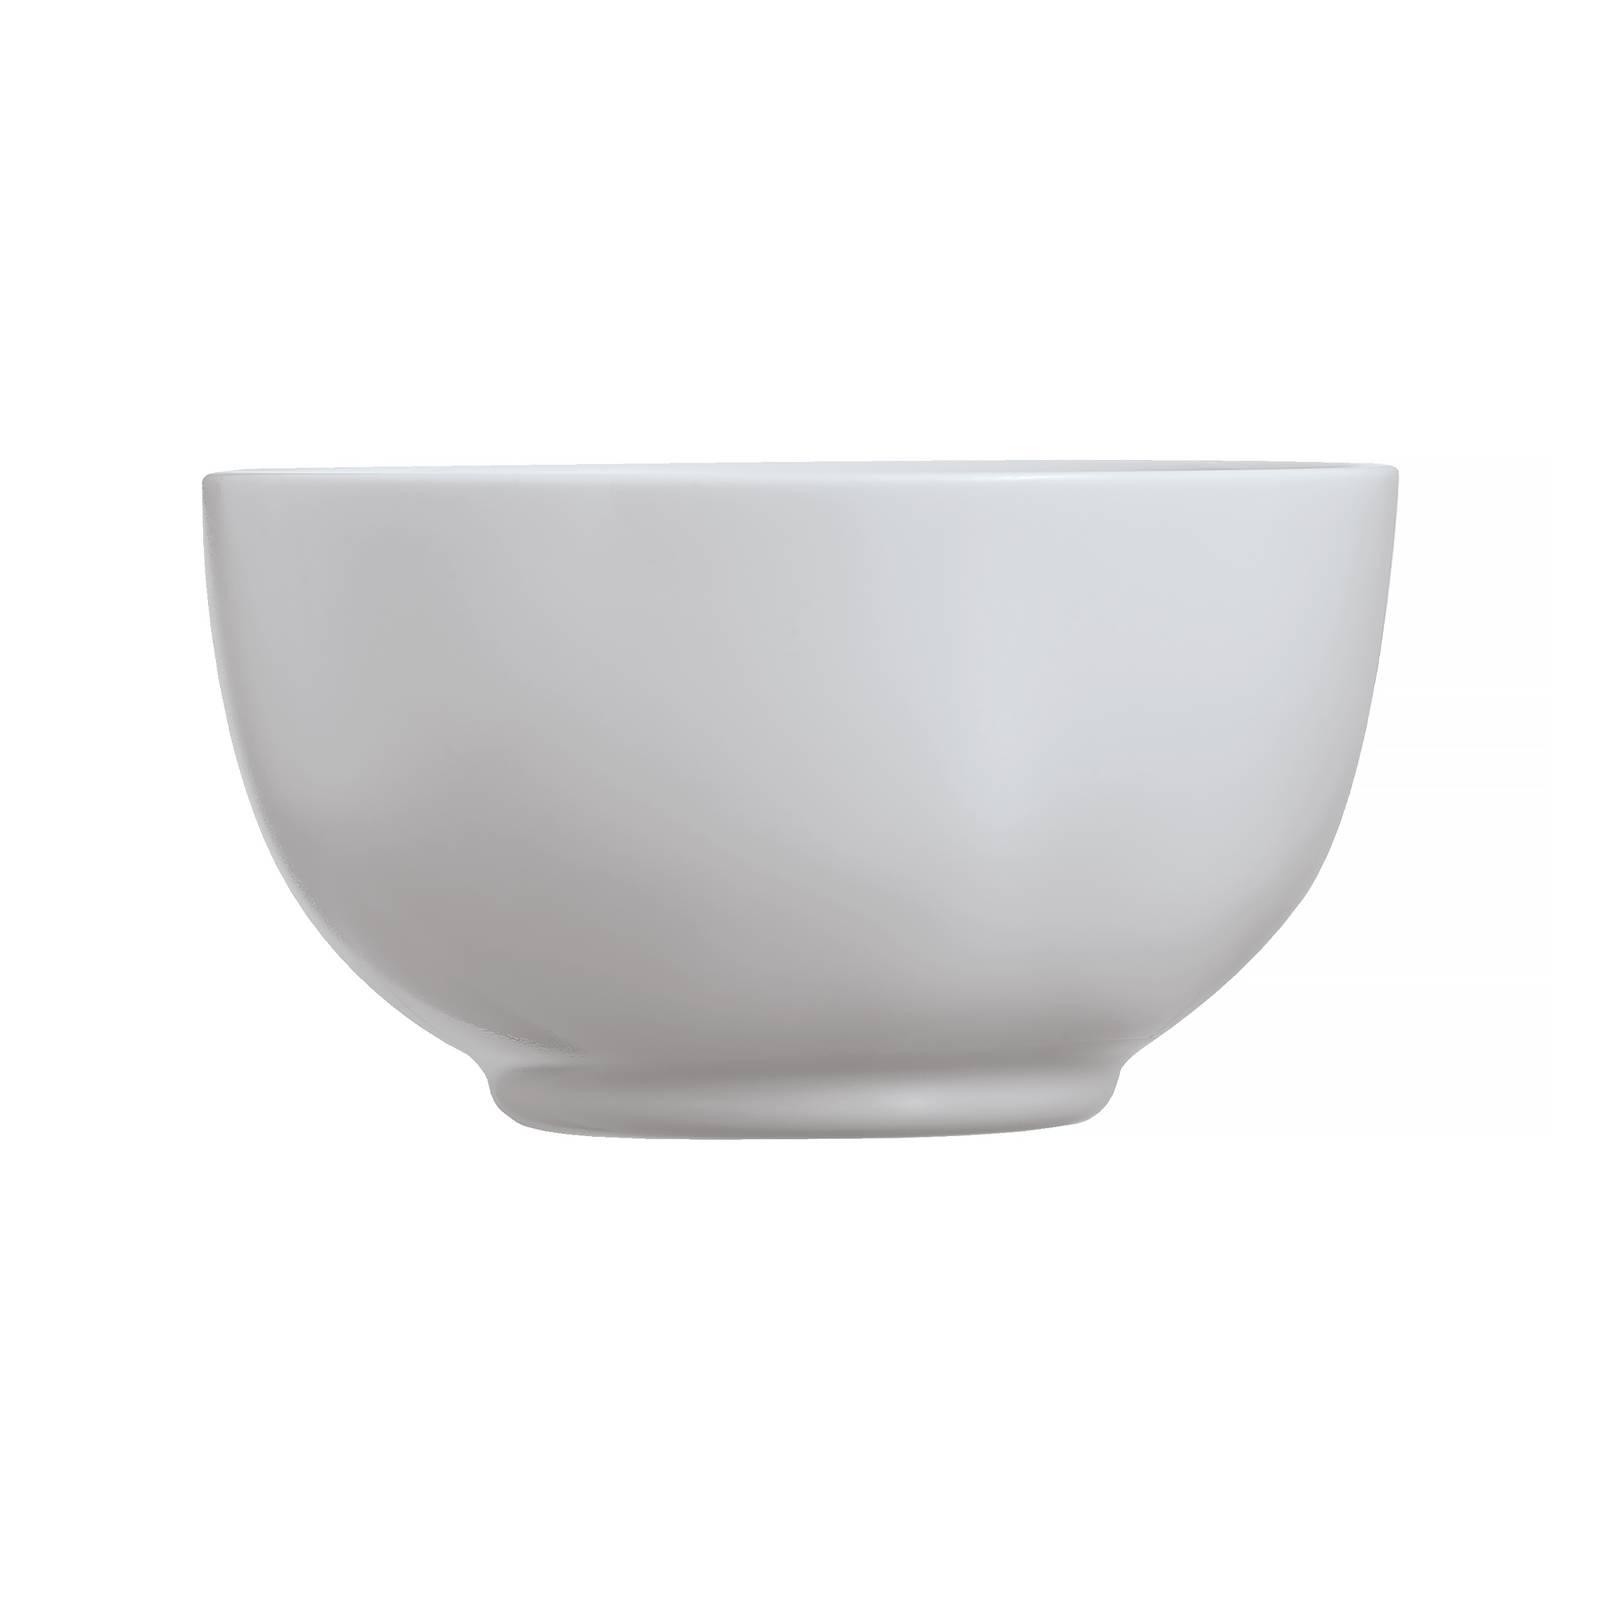 Miska do zupy Diwali 14,5 cm Granit LUMINARC